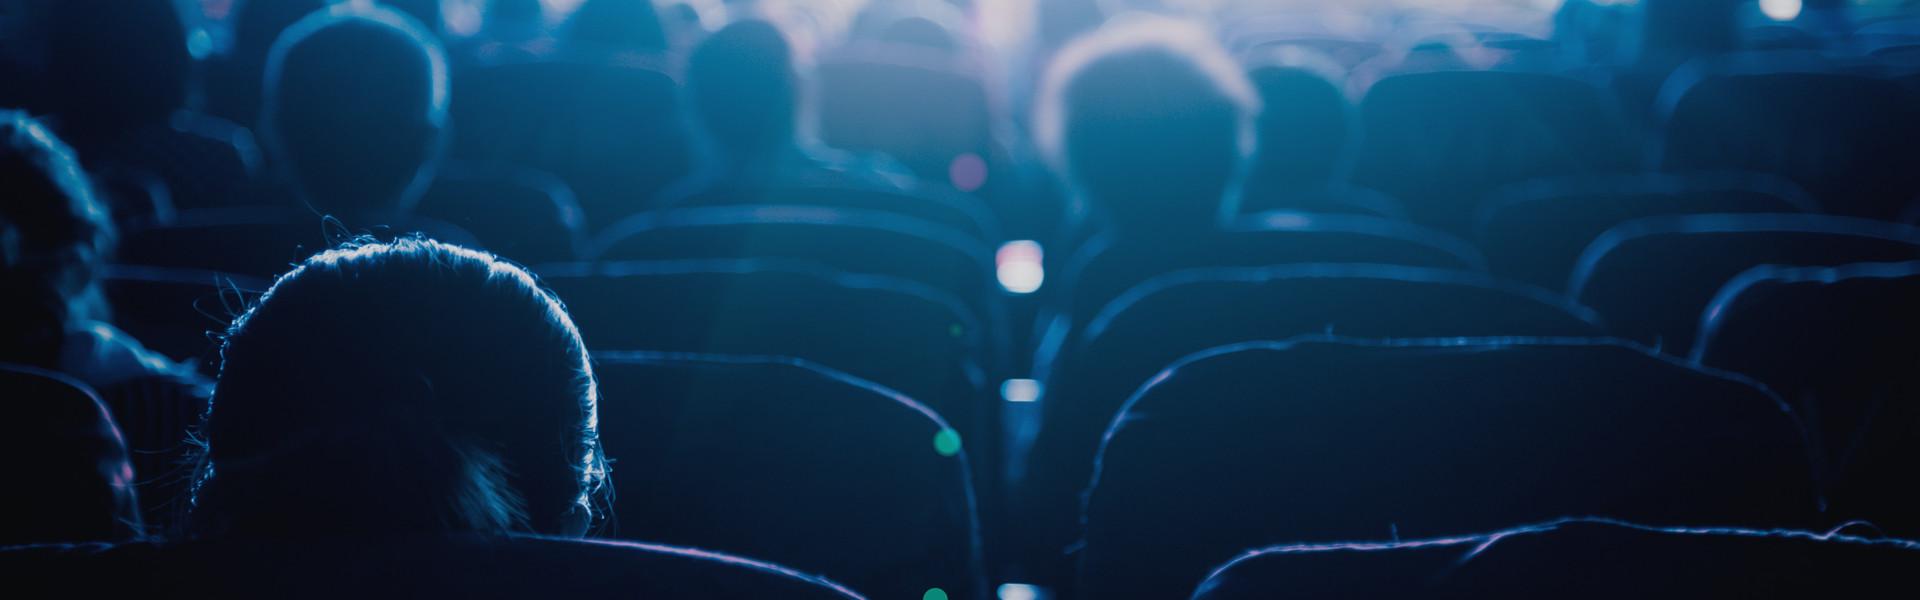 Cinéma Cineplex Laval - Centropolis